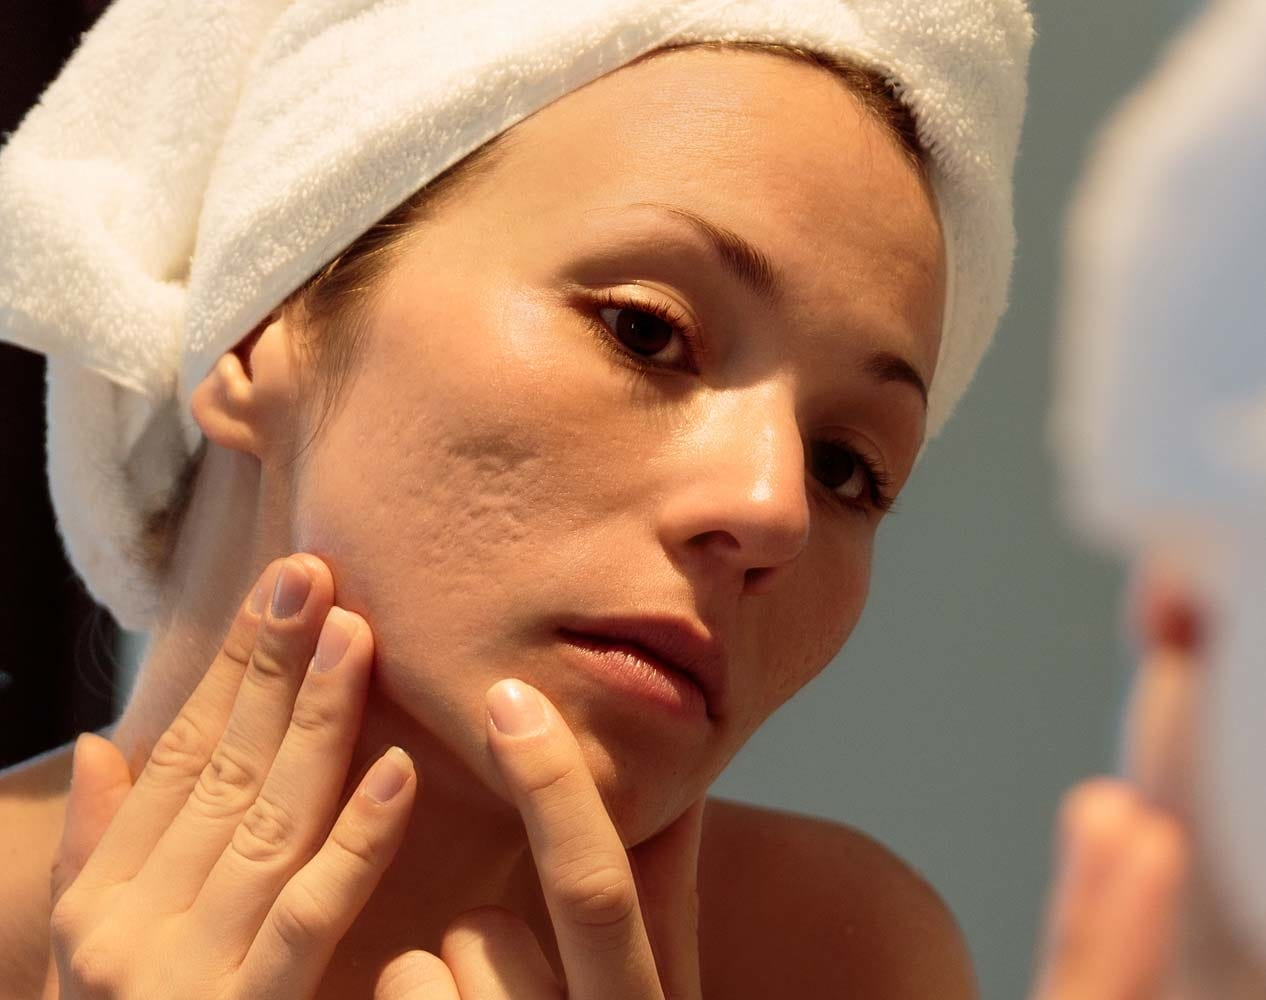 Trikwan - Obagi Medical Acne Express Facial (POM)